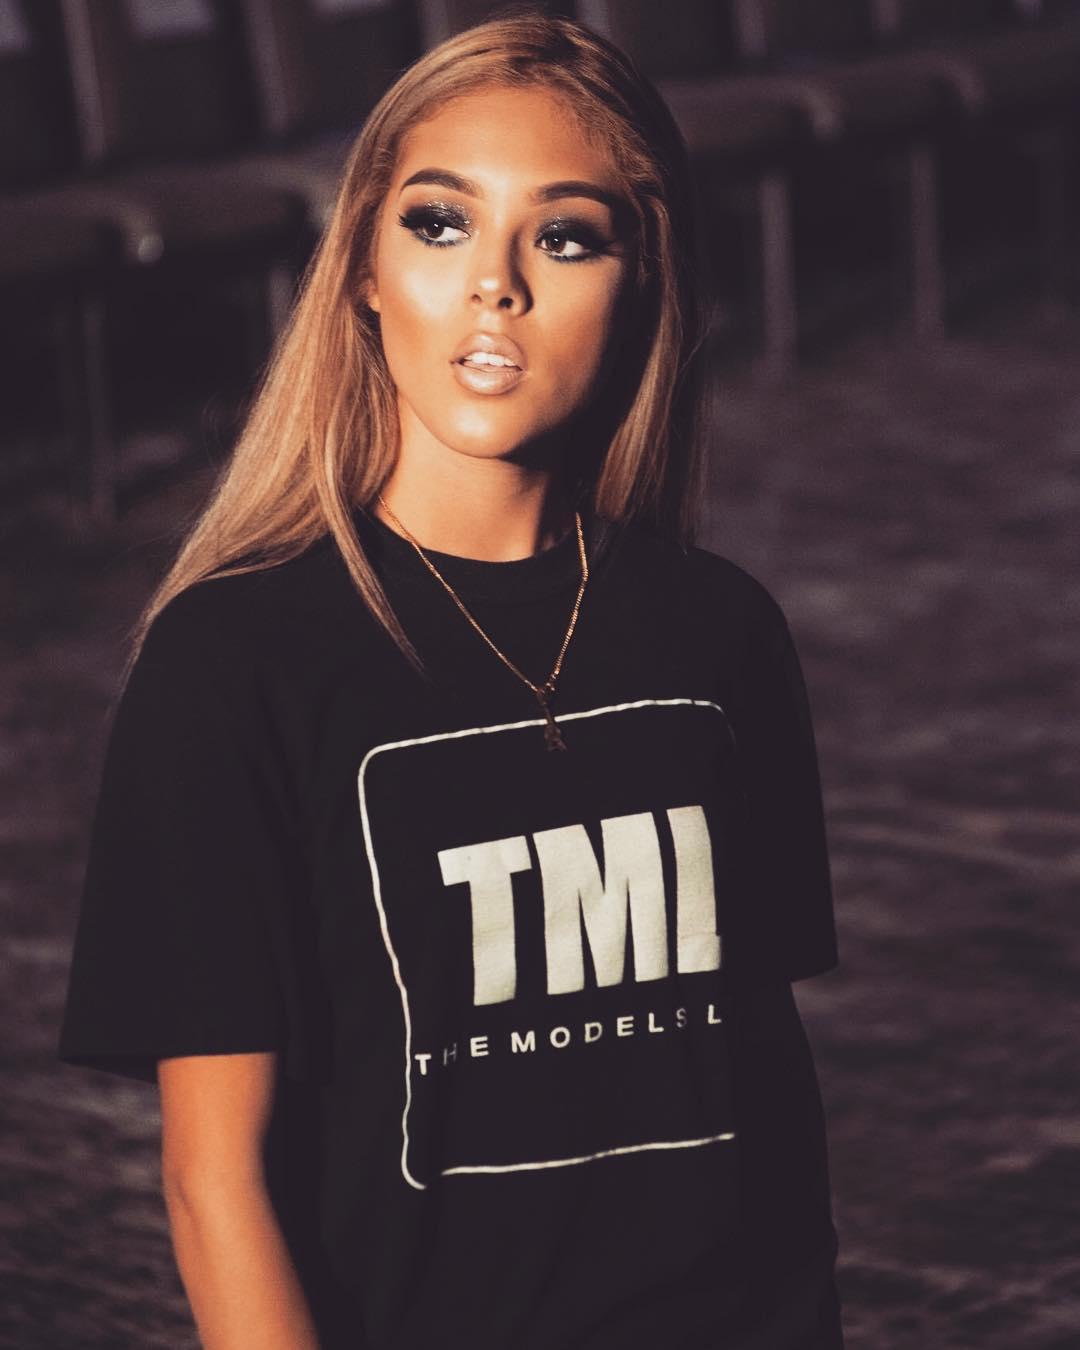 kristian de leon, miss teen mundial usa 2019/top 16 de teen universe 2018. - Página 3 43023110